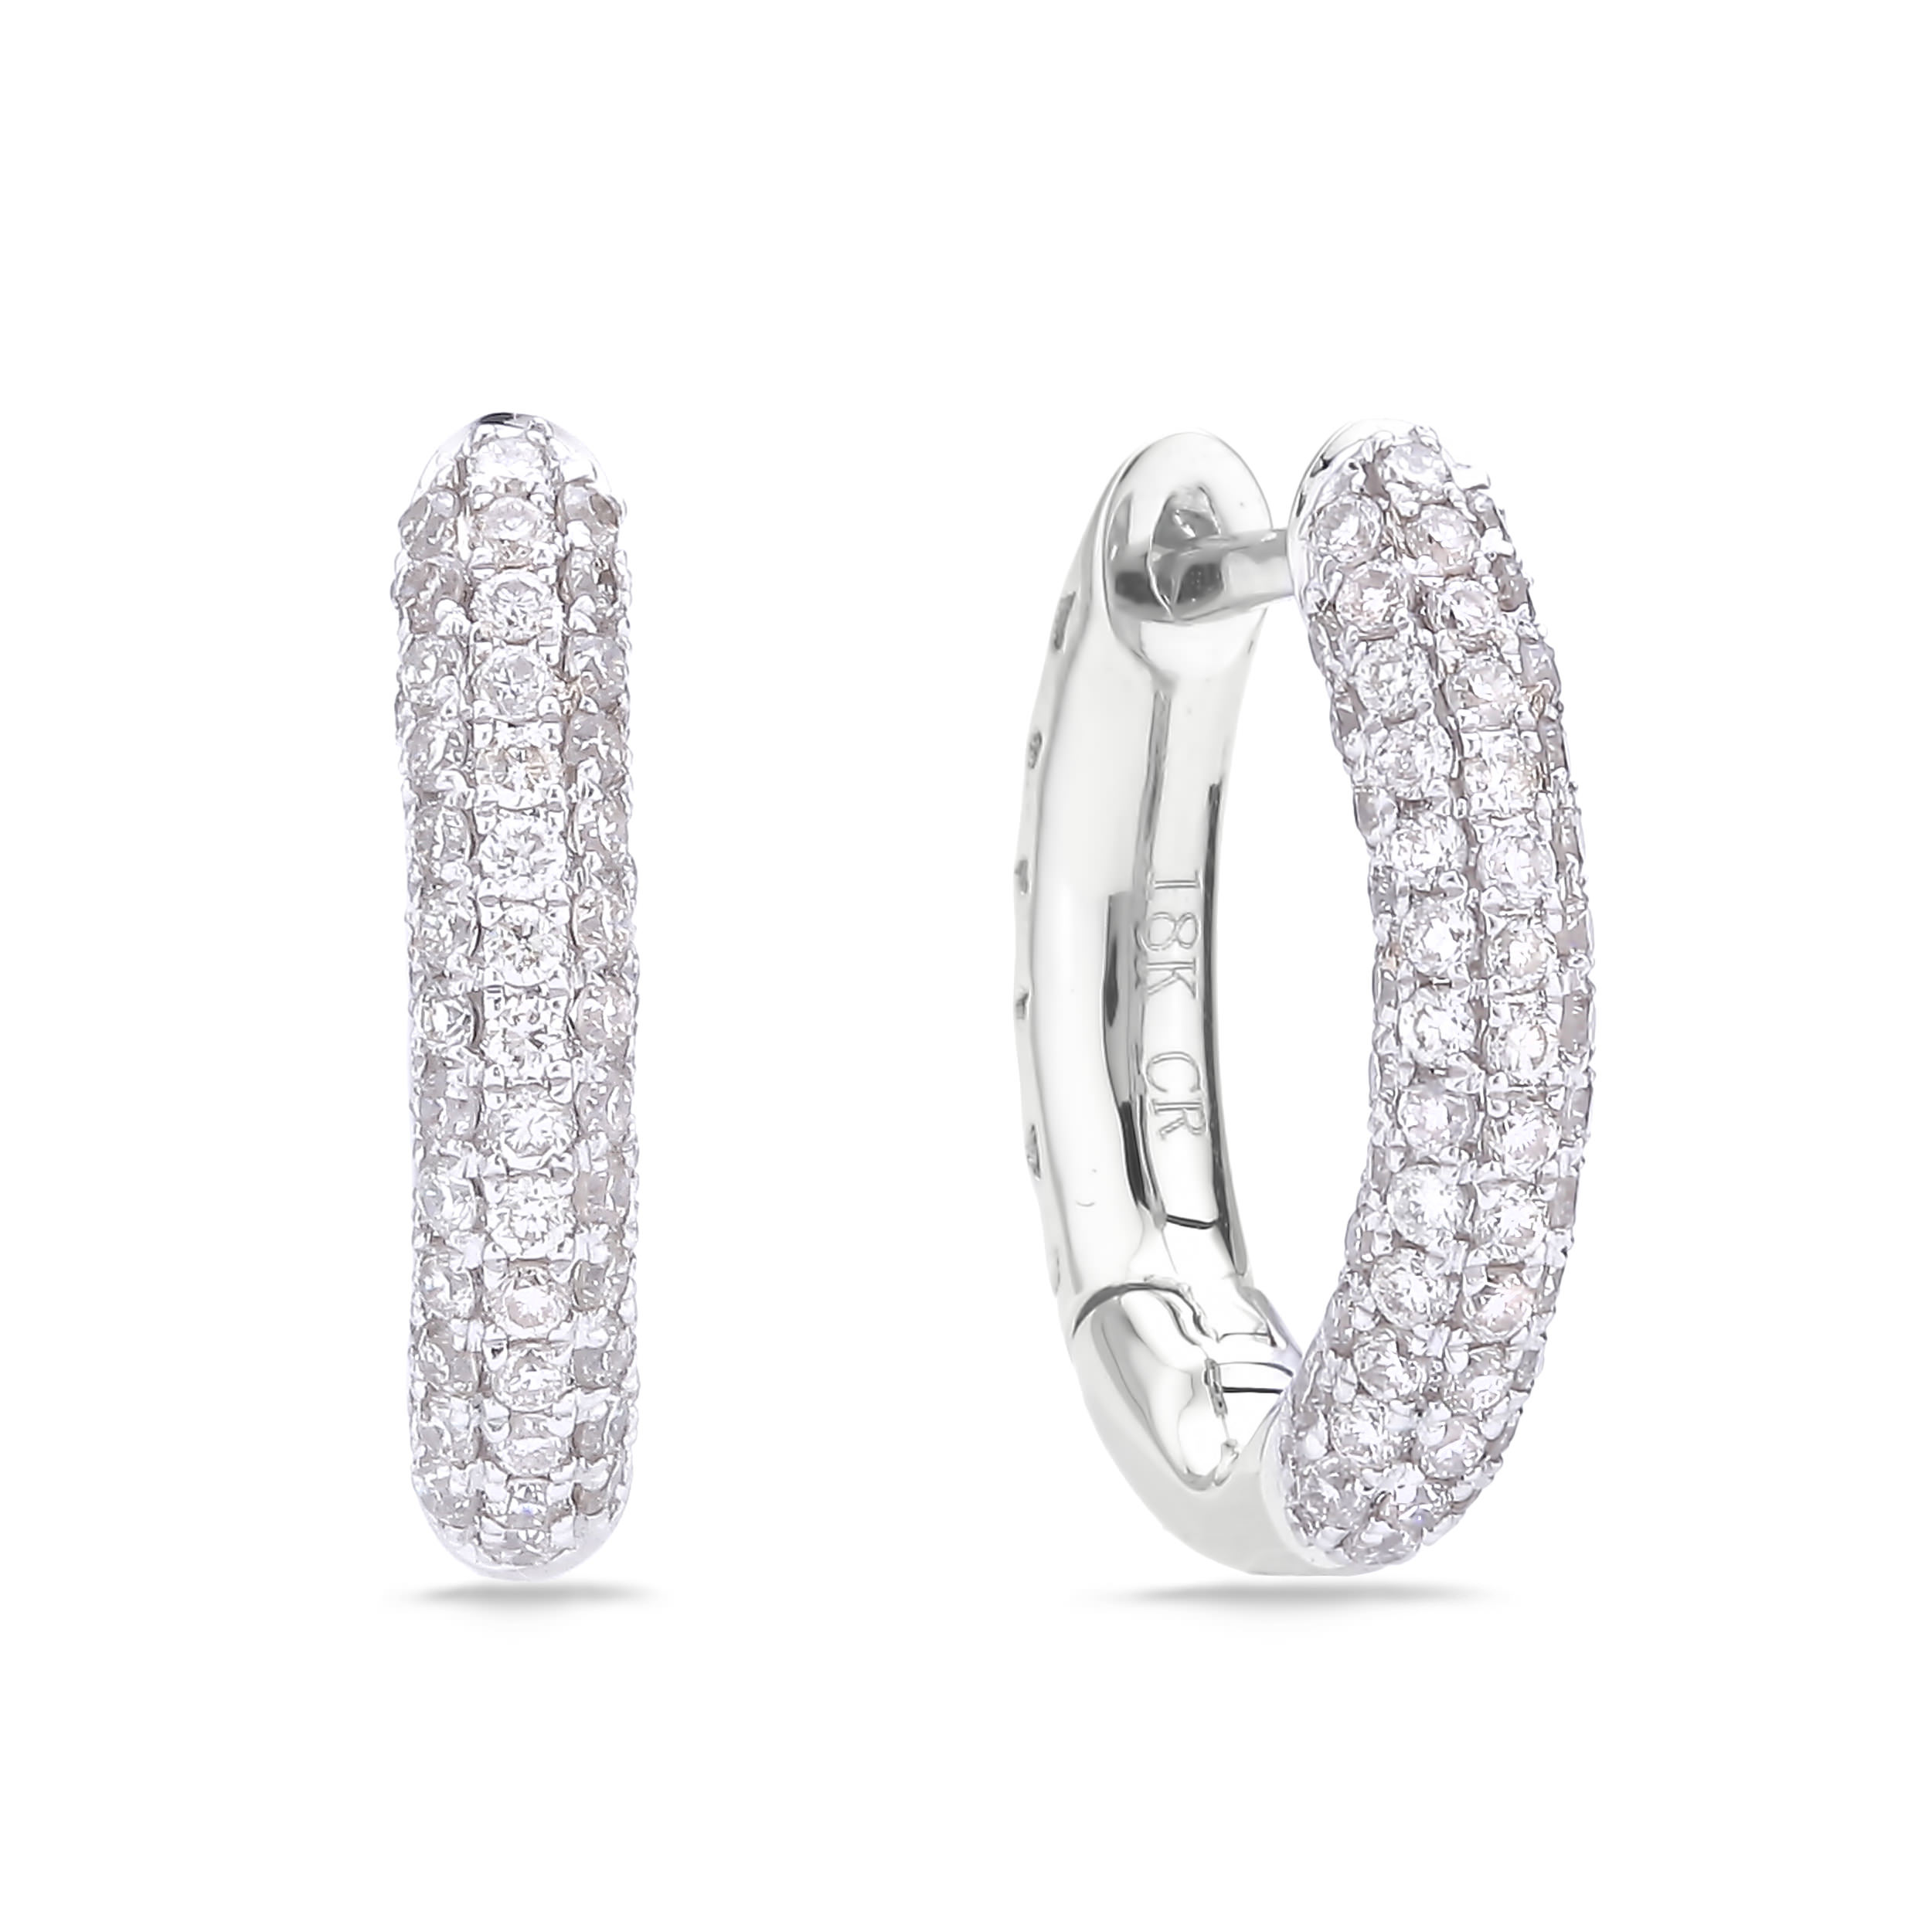 Diamond Hoop Earrings SGE266T (Earrings)